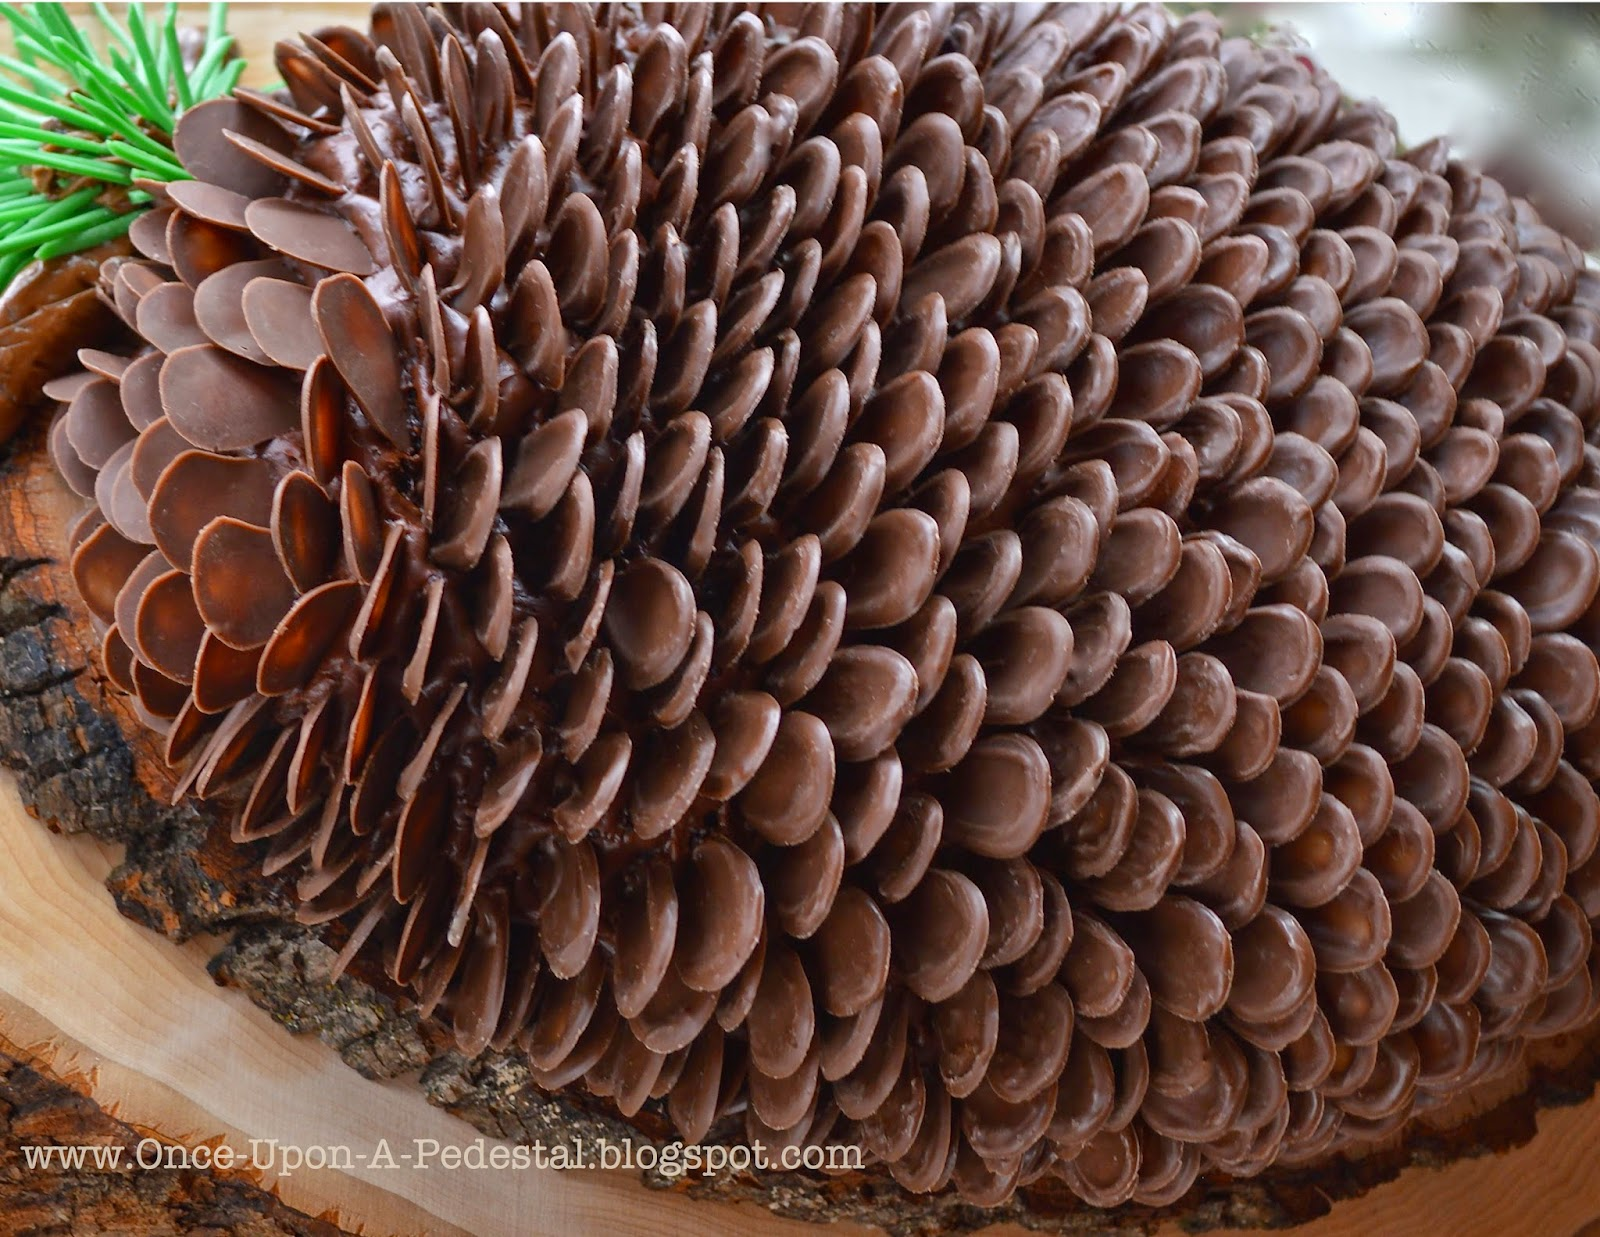 pine-cone-cake-rose-levy-beranbaum-the-cake-bible-christmas-tutorial-deborah-stauch